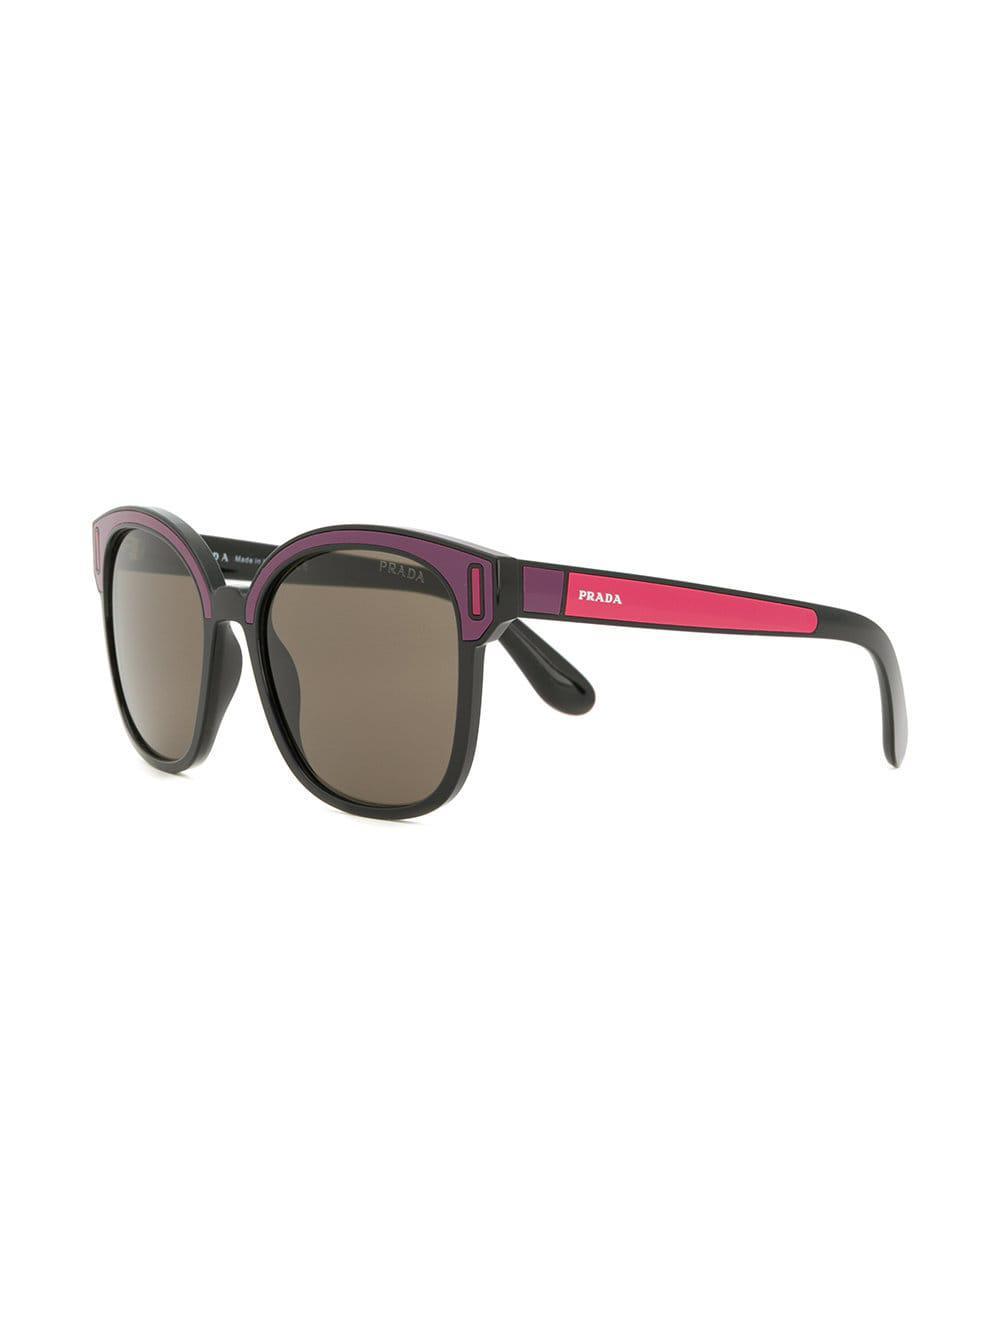 885875799e4 Prada - Pink Colourblock Square Sunglasses - Lyst. View fullscreen